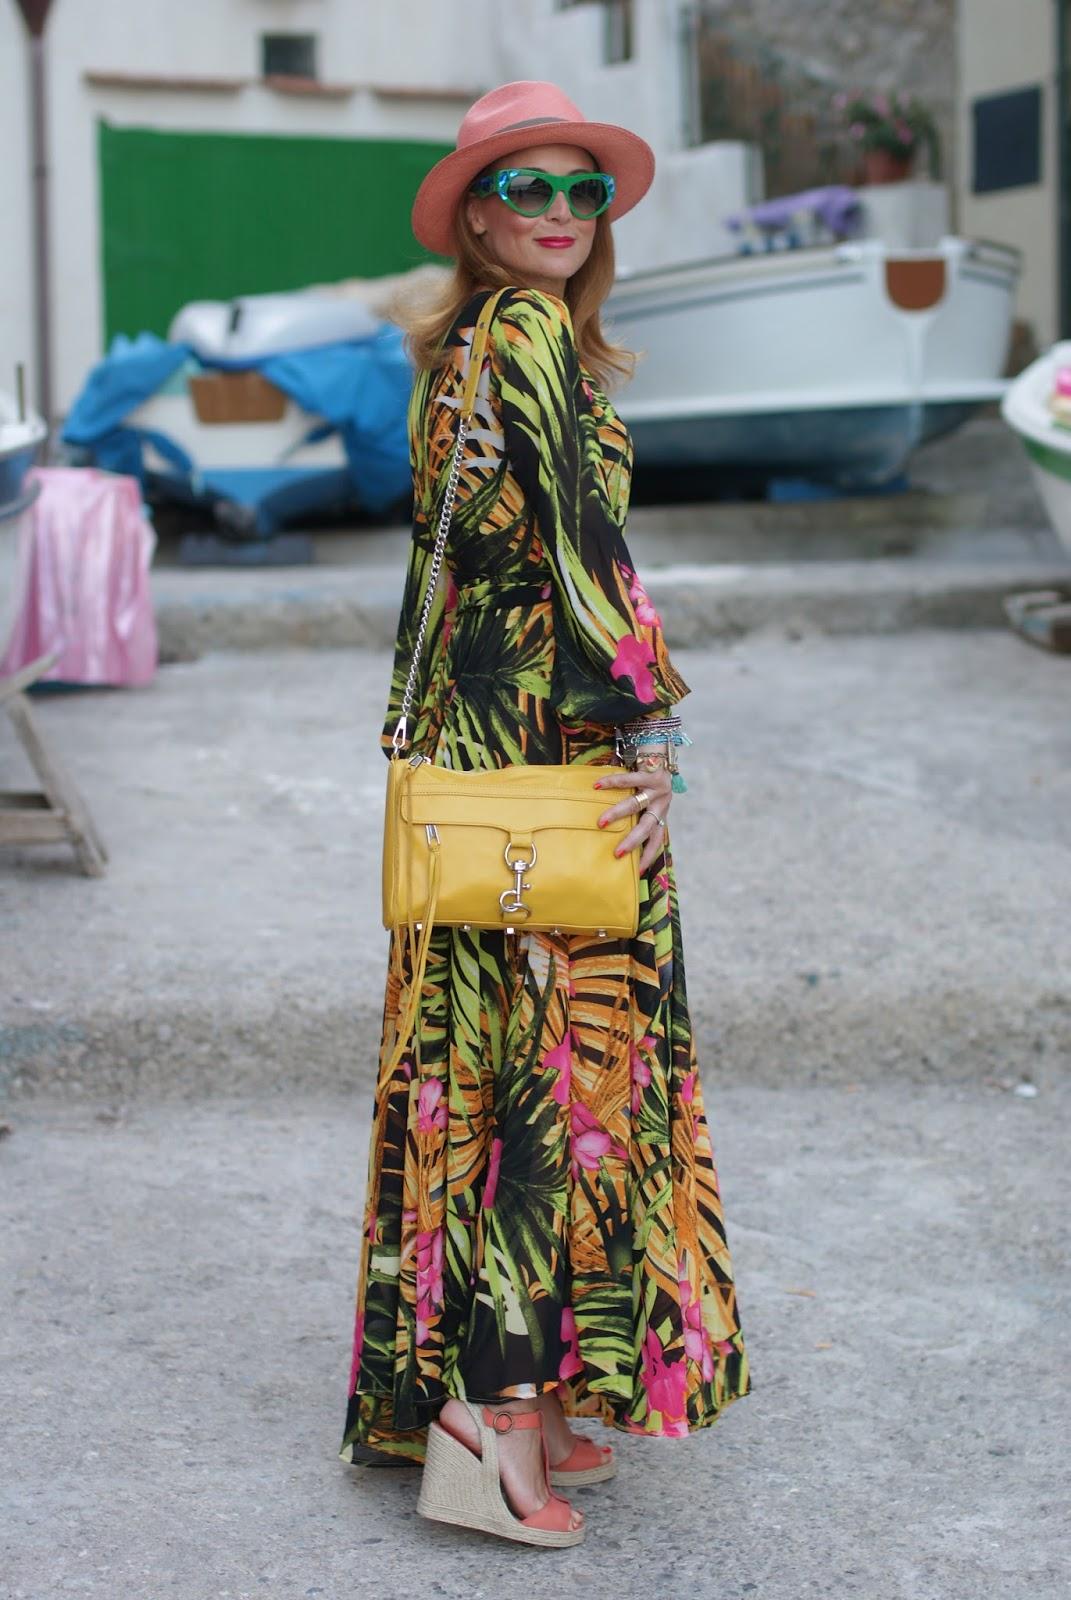 prada voice sunglasses found on giarre dot com, tropical print chiffon maxi dress with espadrilles, ecua-andino hat for a summer boho style on Fashion and Cookies fashion blog, fashion blogger style